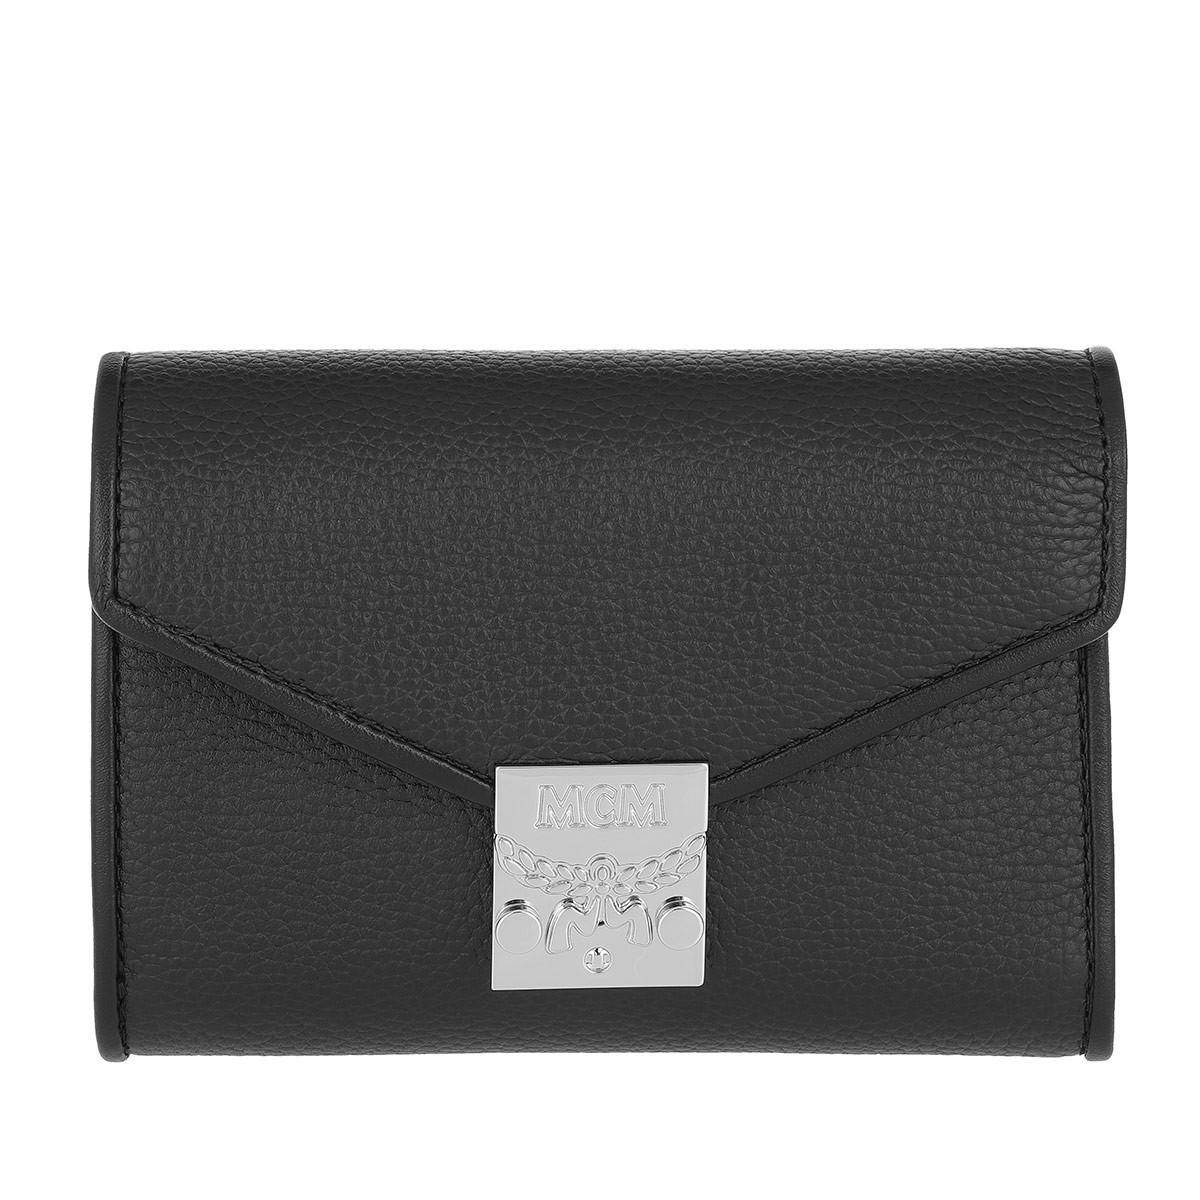 MCM Portemonnaie - Patricia Park Avenue Flap Wallet Tri-Fold Small Black - in schwarz - für Damen